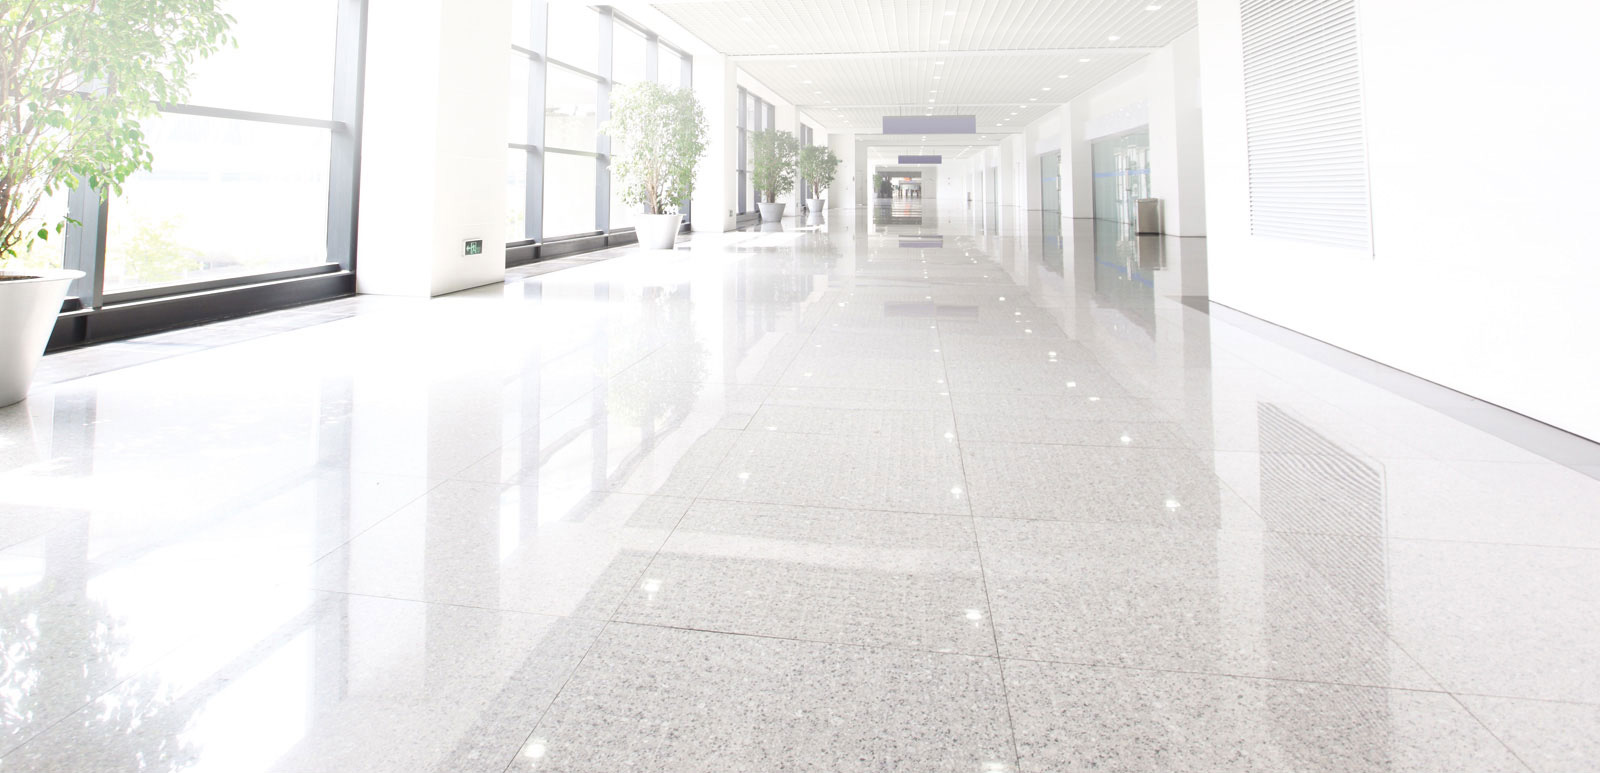 Liquid vinyl flooring solutions safe guard flooring for Flooring solutions